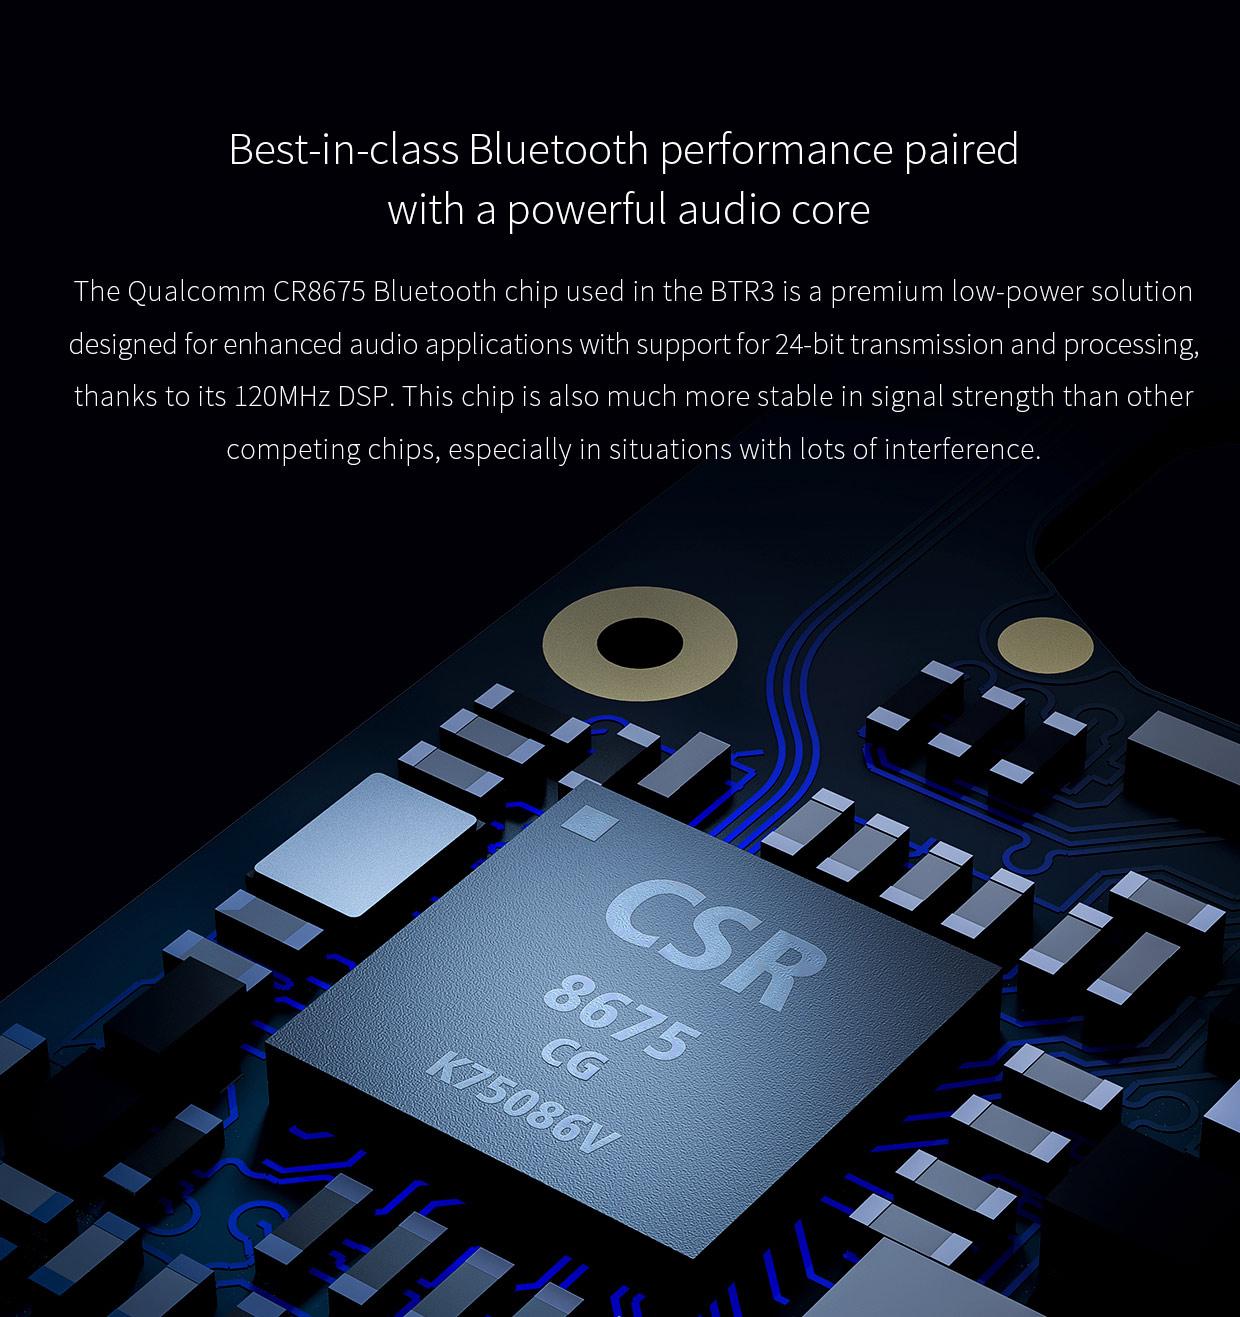 FiiO BTR3 Bluetooth 5.0 Portable Headphone Amplifier DAC/AMP สีดำ รองรับอุปกรณ์ iOS Android ของแท้ ประกันศูนย์ 1ปี